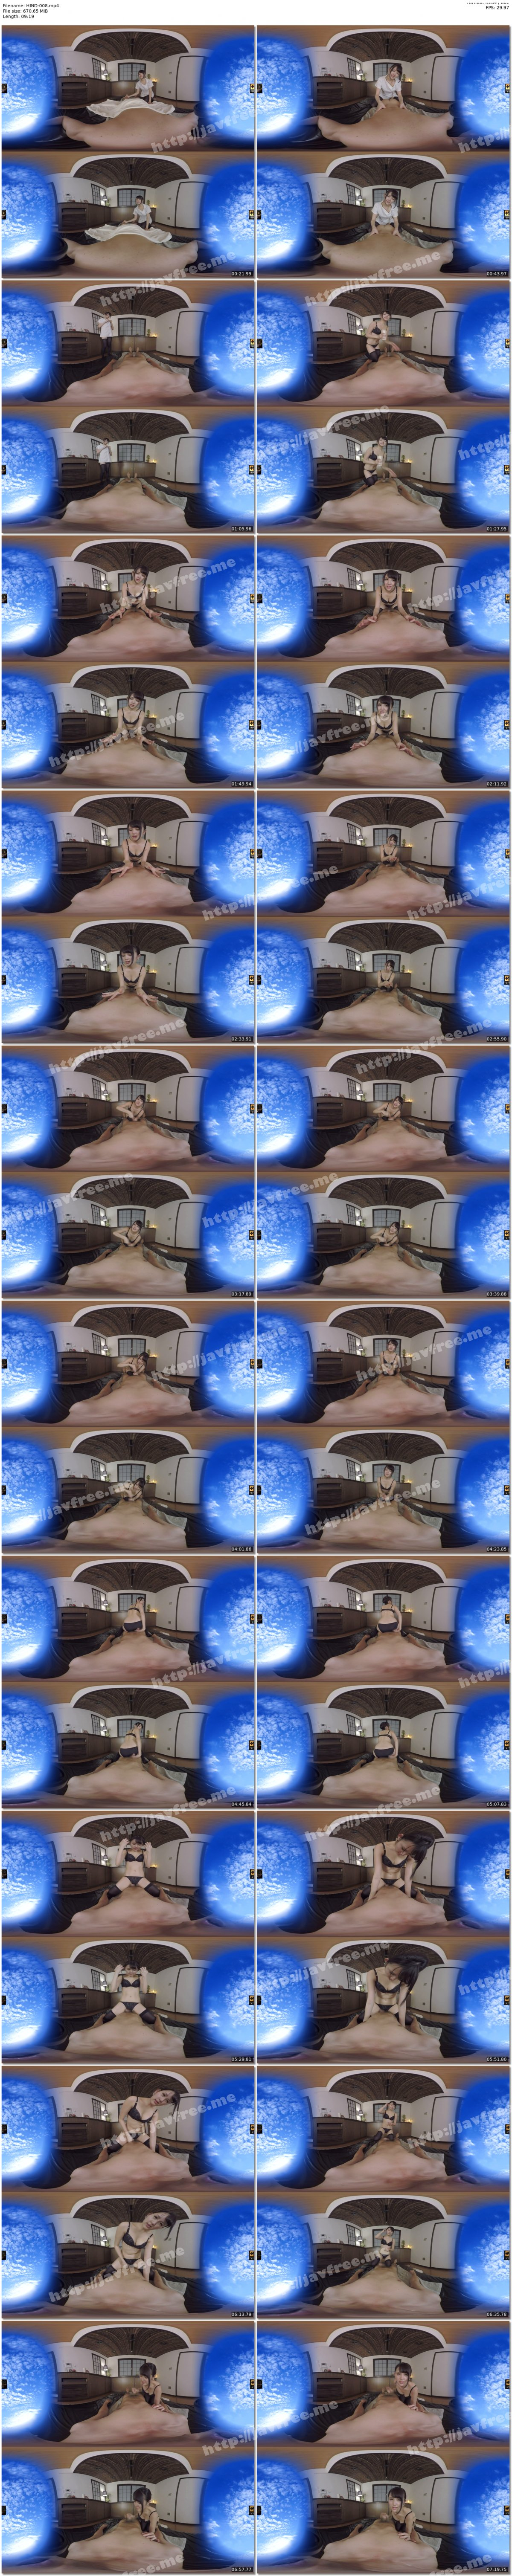 [HIND-008] 【VR】淫語エステサロン 絶品ハンドテクでご奉仕2 倉持りん - image HIND-008 on https://javfree.me